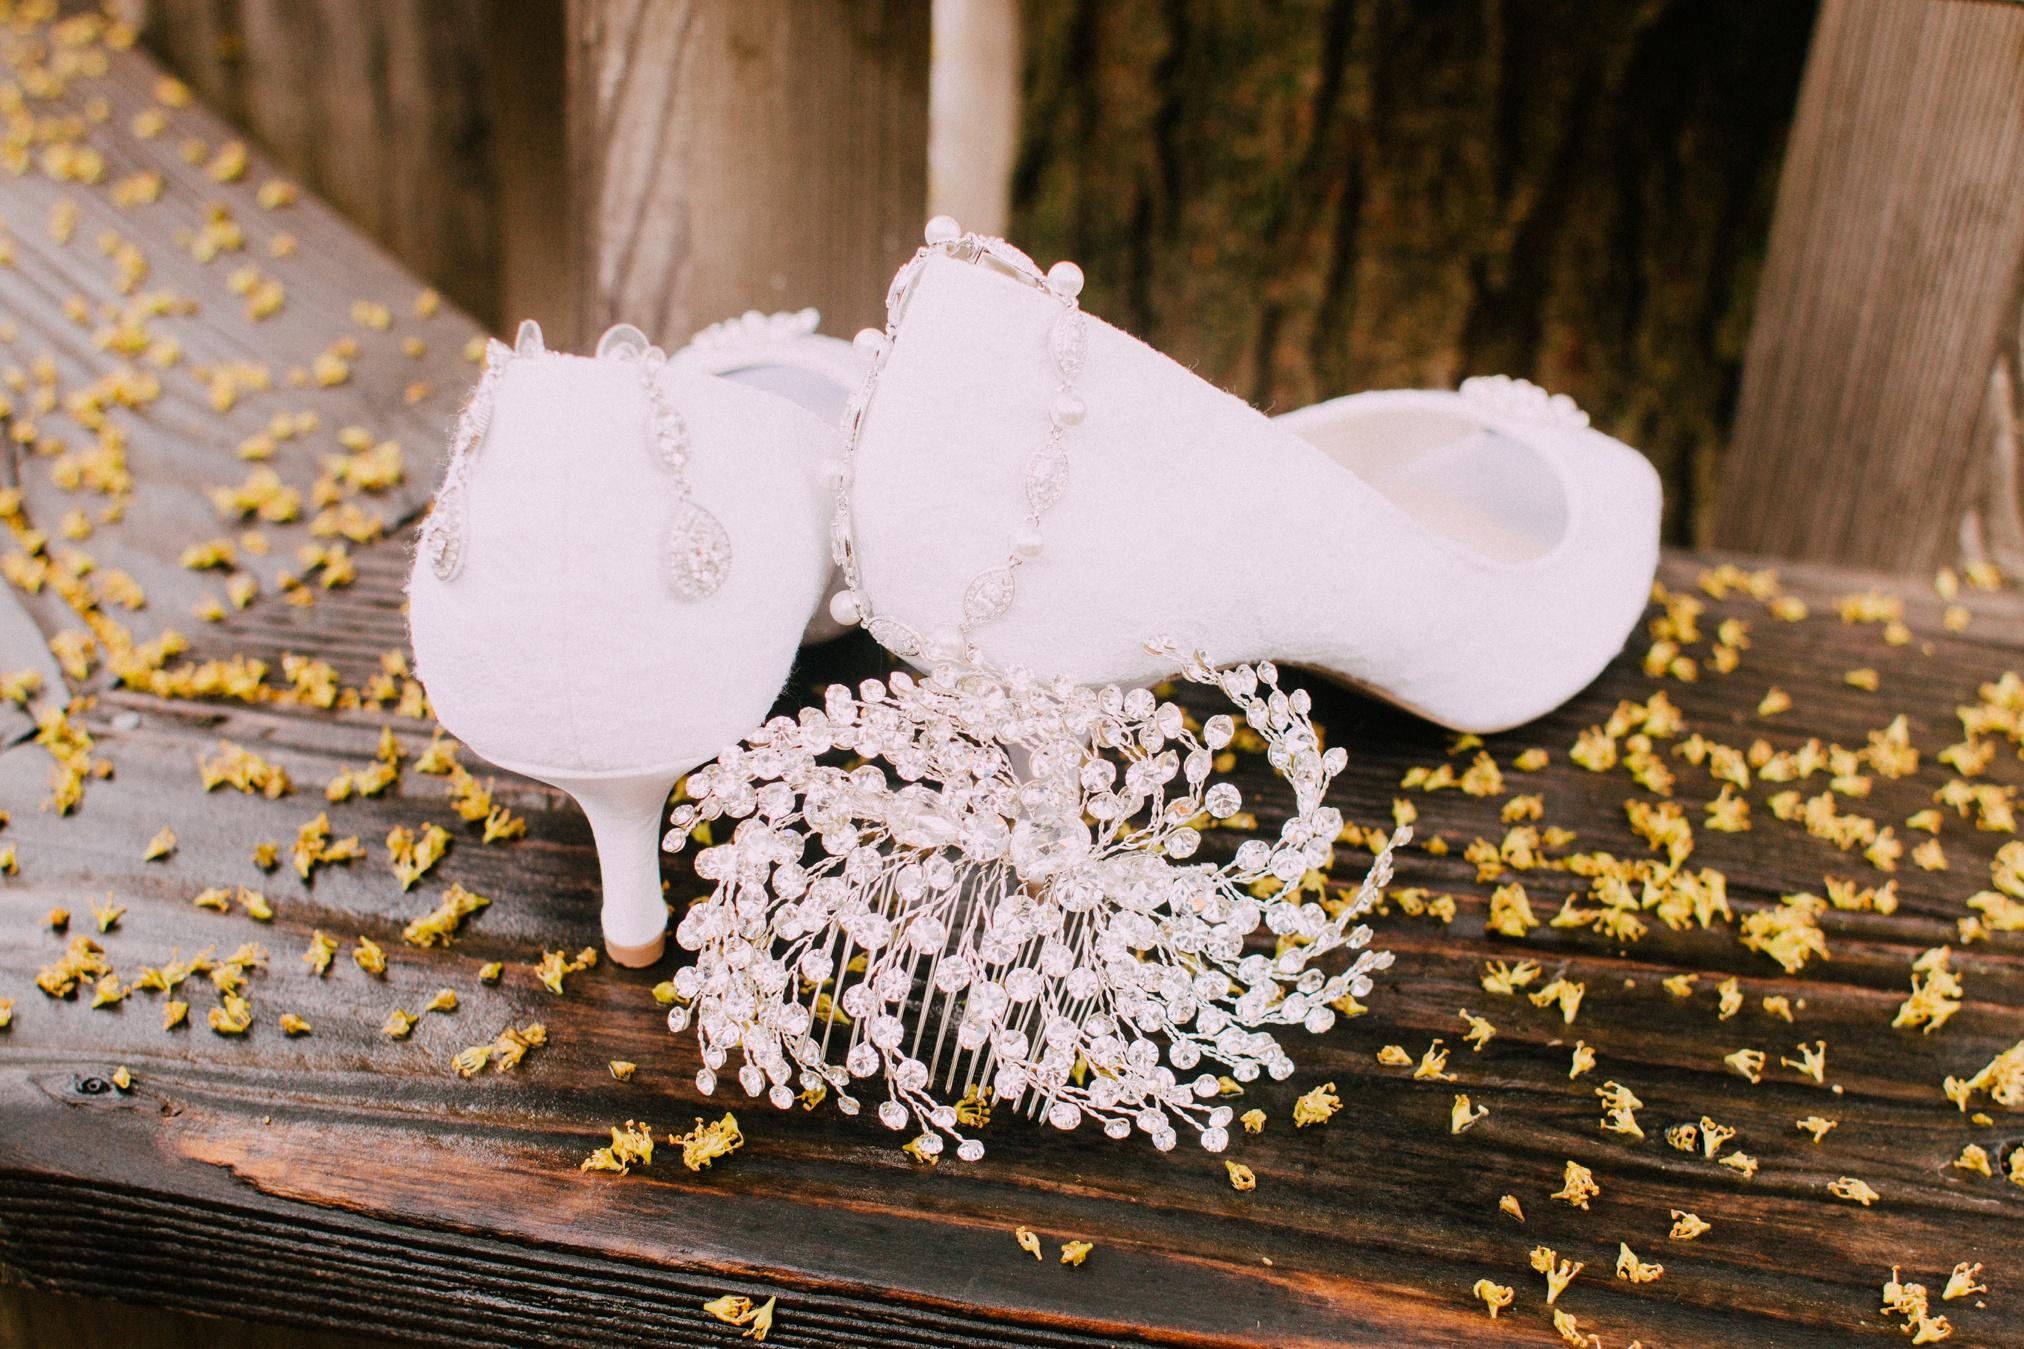 schmid_wedding-11.jpg